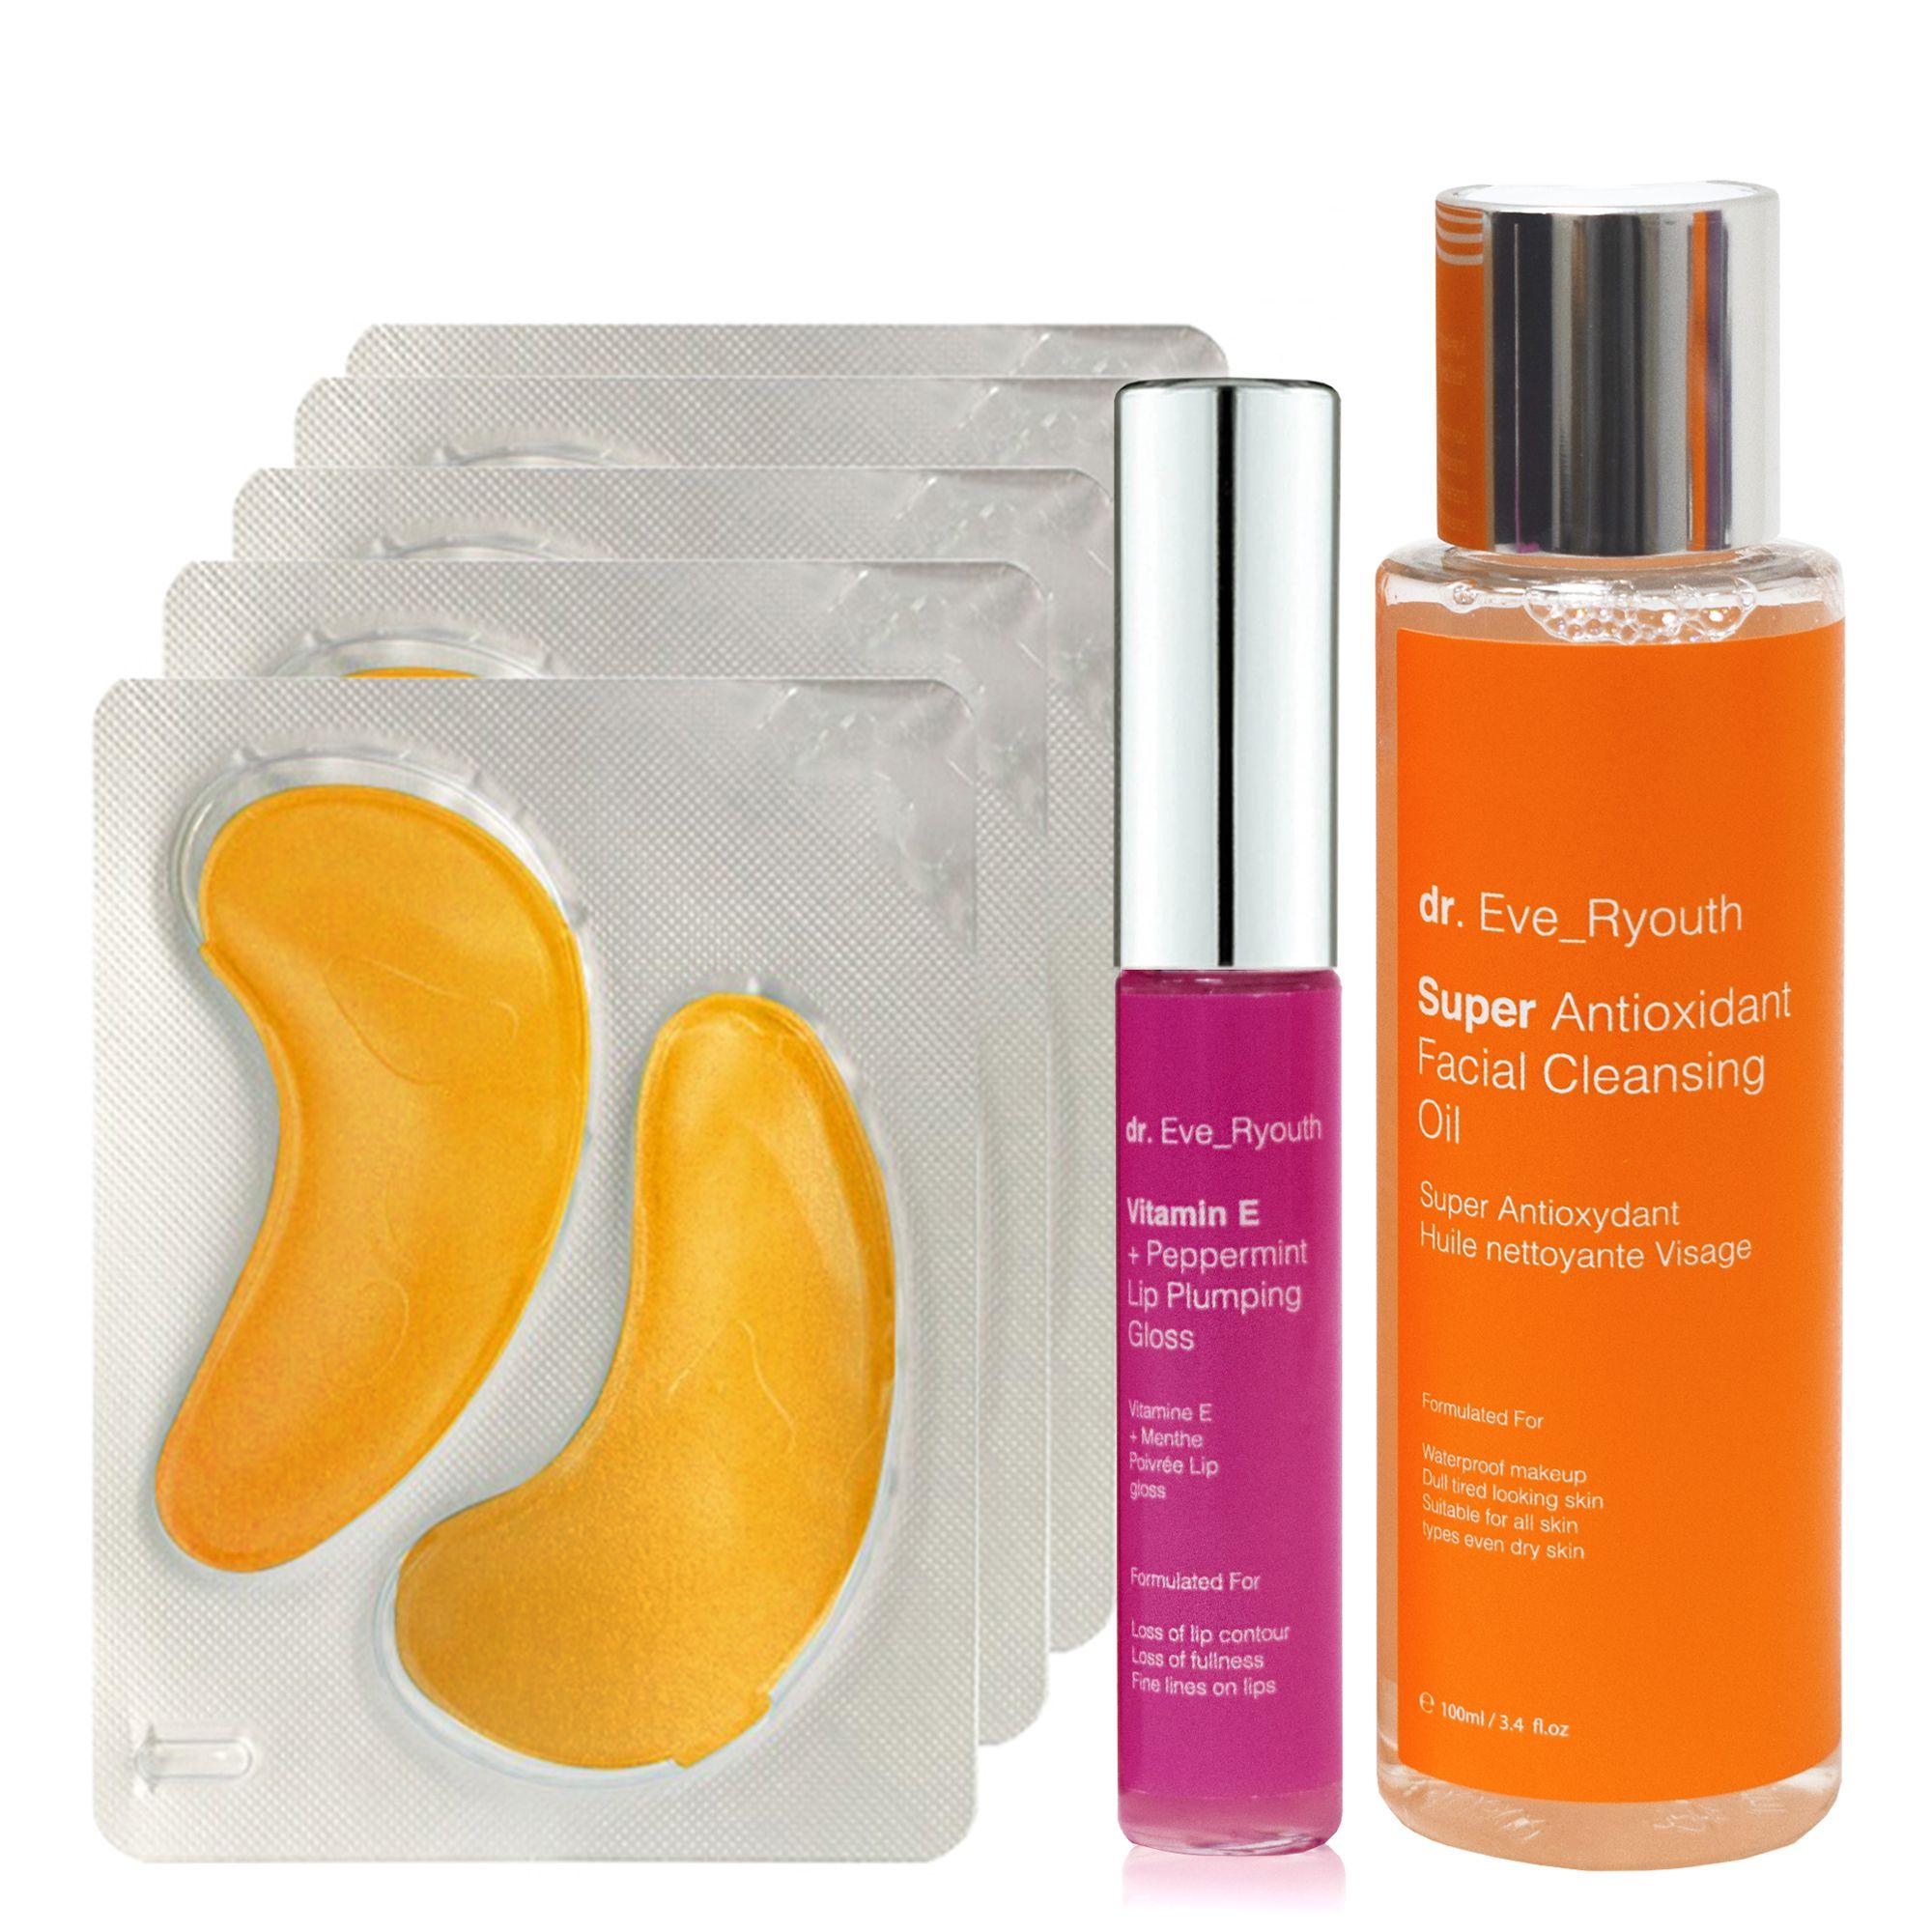 24K Gold + Antioxidant Hydrating Eye Treatments Pads + Super Antioxidant Facial Cleansing Oil 100ml + Vitamin E and Peppermint Lip Plumps 8mlÂ